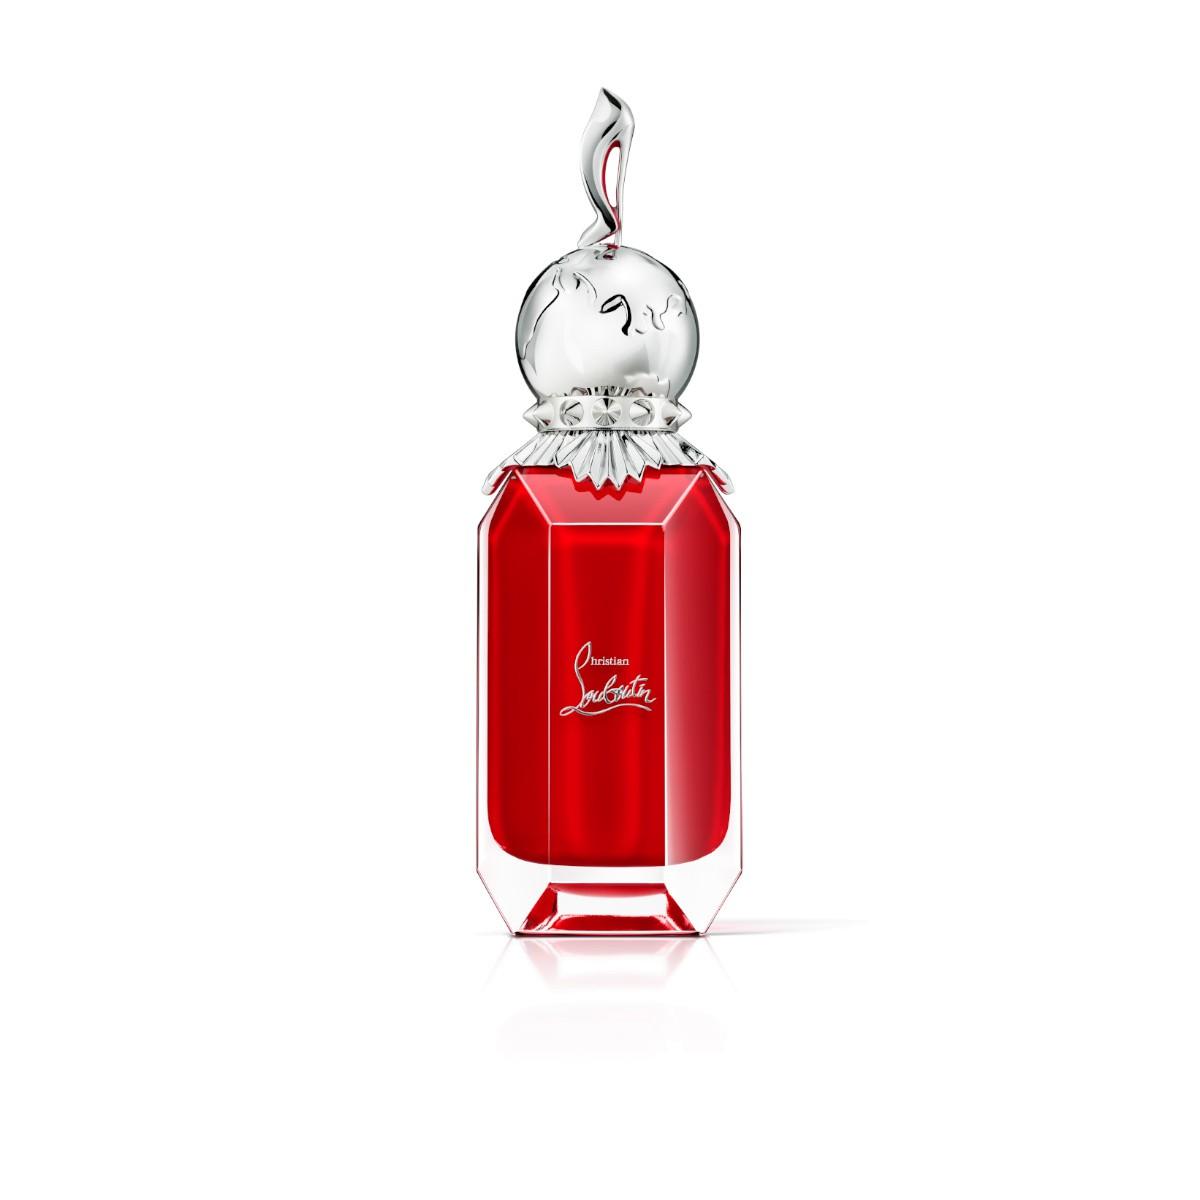 化妆品 - Loubirouge Eau De Parfum - Christian Louboutin